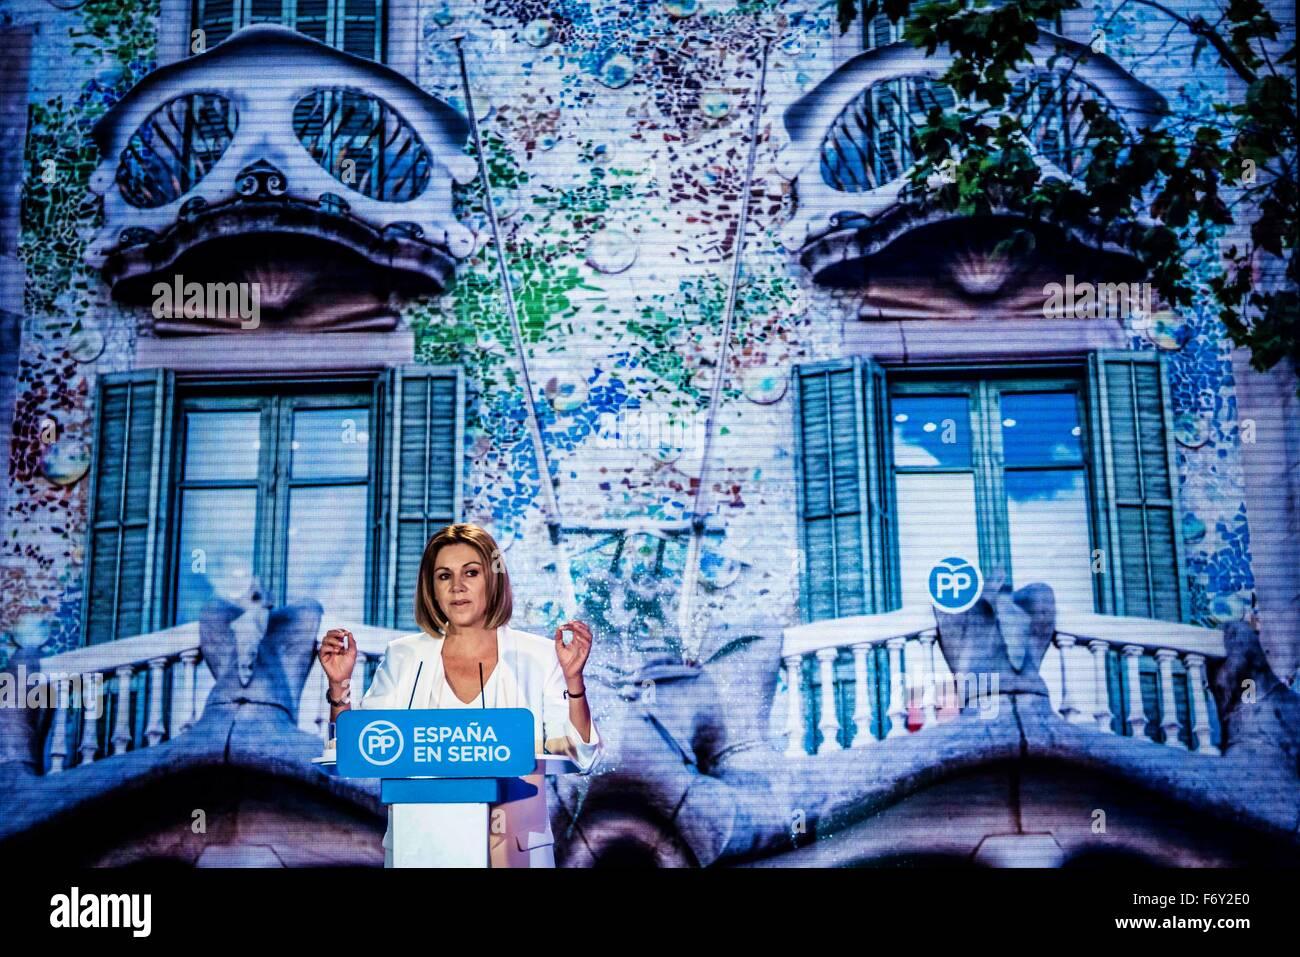 Barcelona, Spain. 21st Nov, 2015. Barcelona, Spain: MARIA DOLORES COSPEDAL, General Secretary of the PP (People's Stock Photo